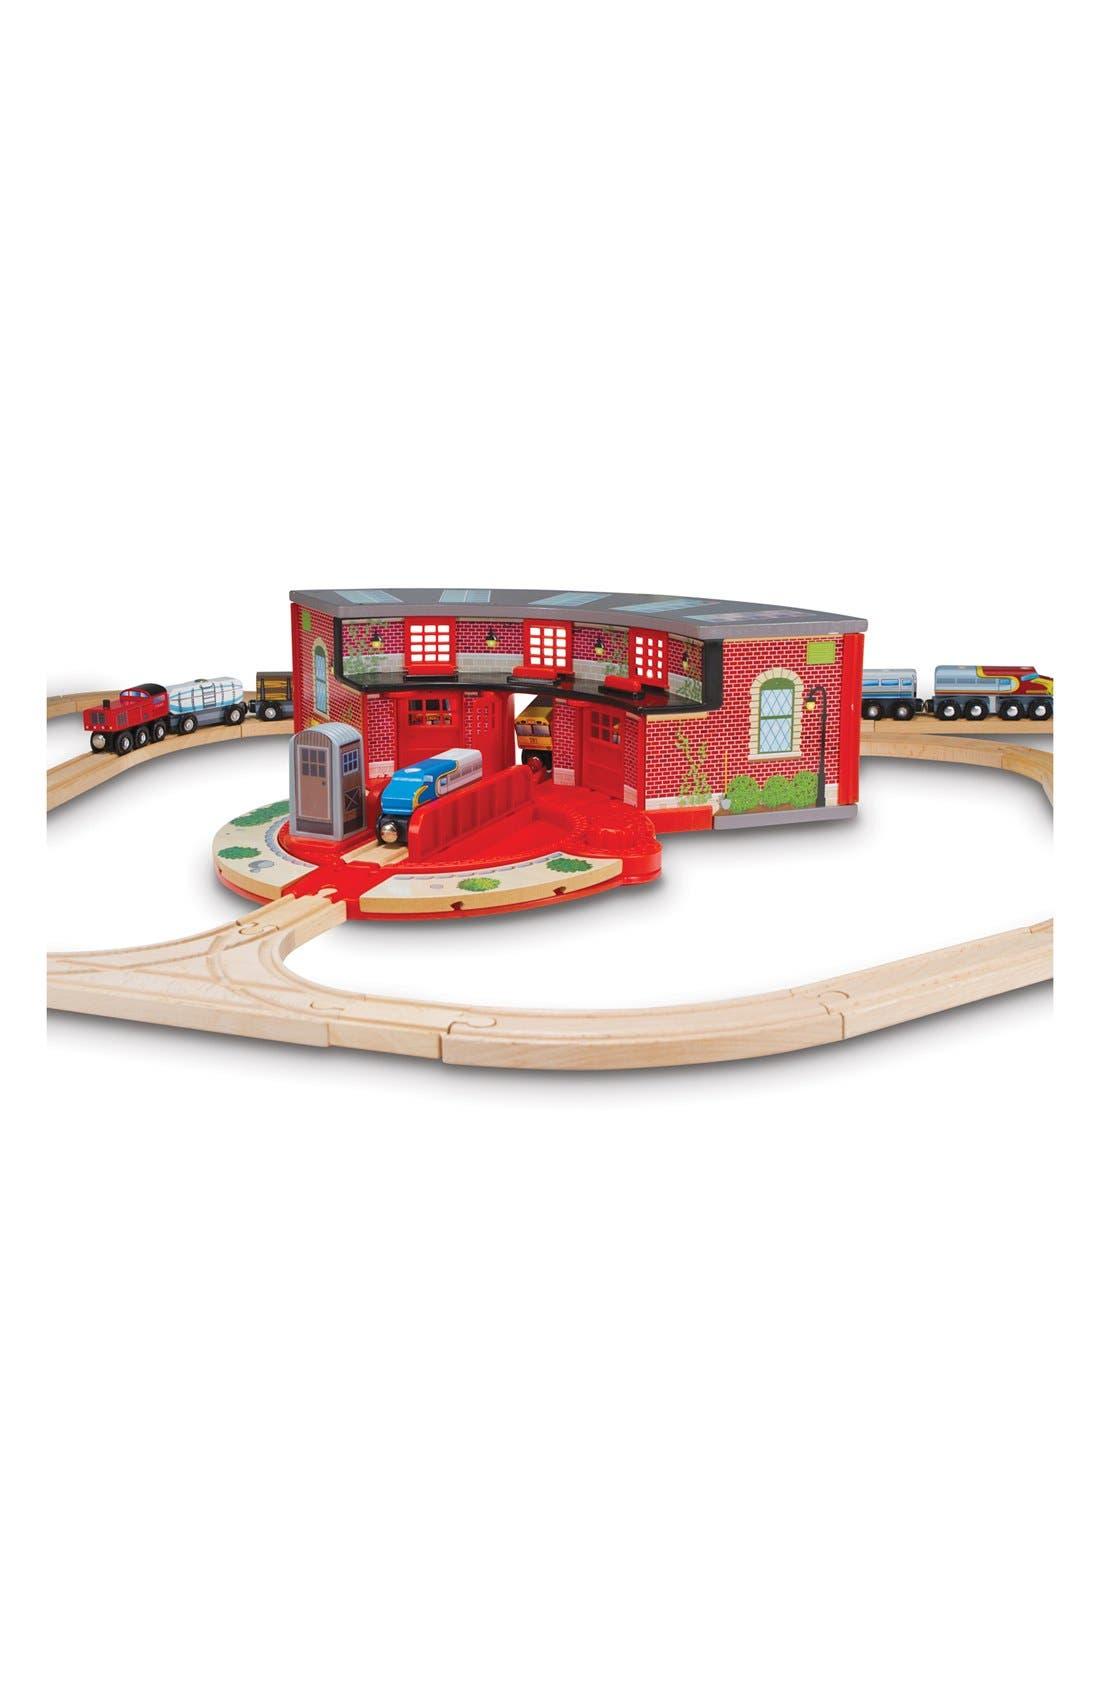 MELISSA & DOUG 'Roundhouse & Turntable' Wooden Toy